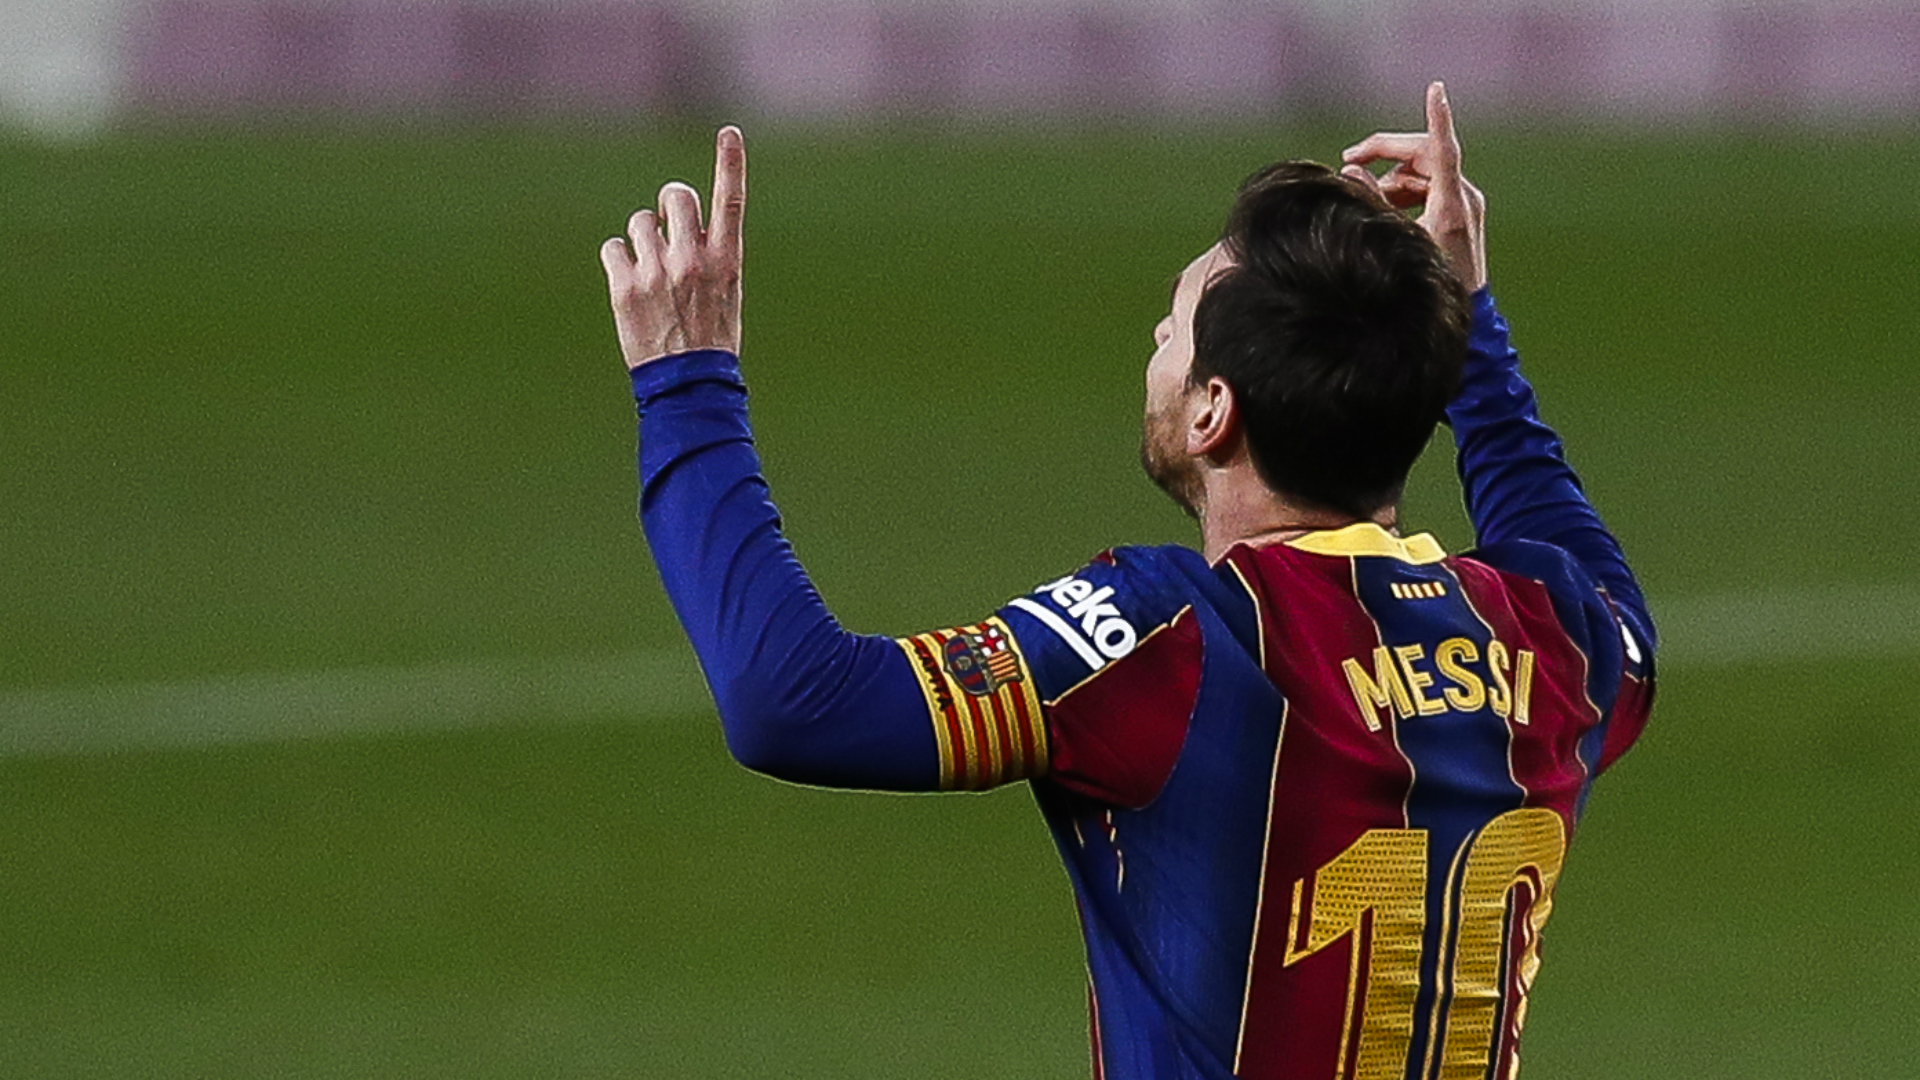 Barcelona 2-2 Valencia: Messi matches Pele record but Koeman's men are held at Camp Nou